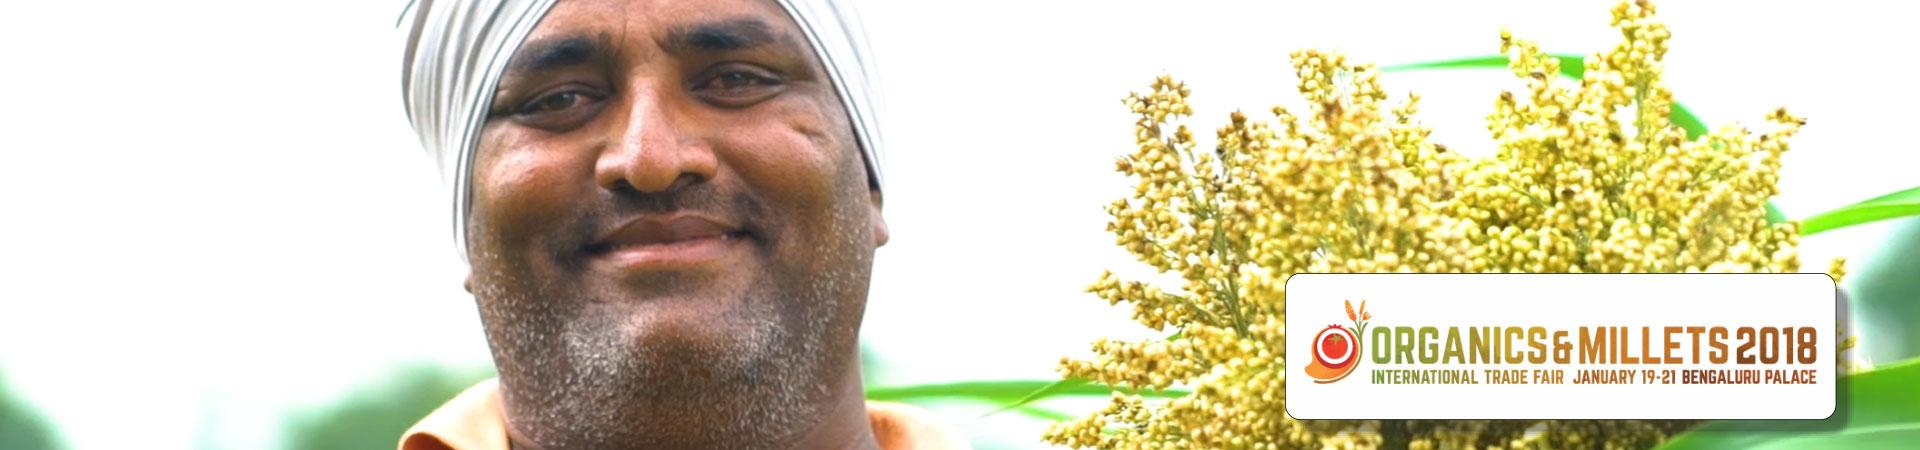 organic-millets-karnataka